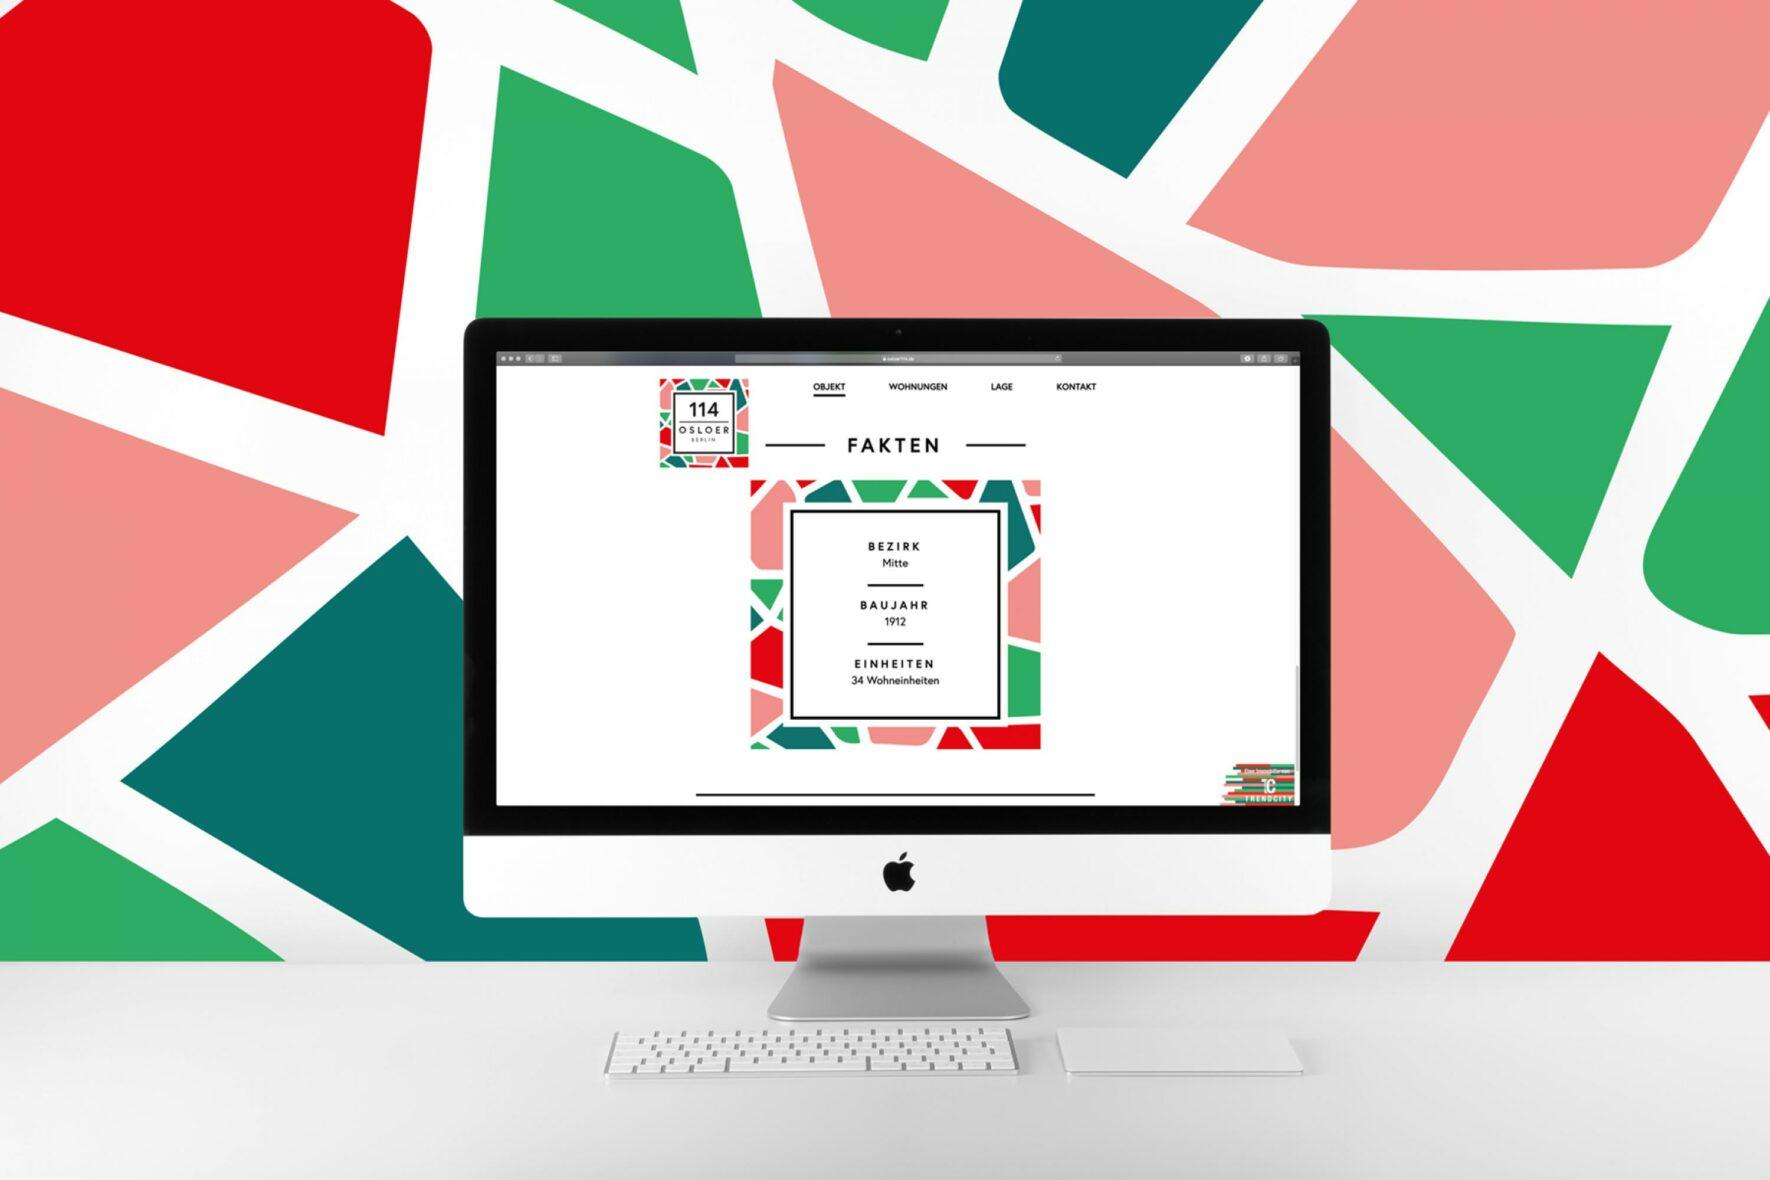 Webdesign-Osloer114-Trendcity-Immobilien-FORMLOS-Berlin-Design-4